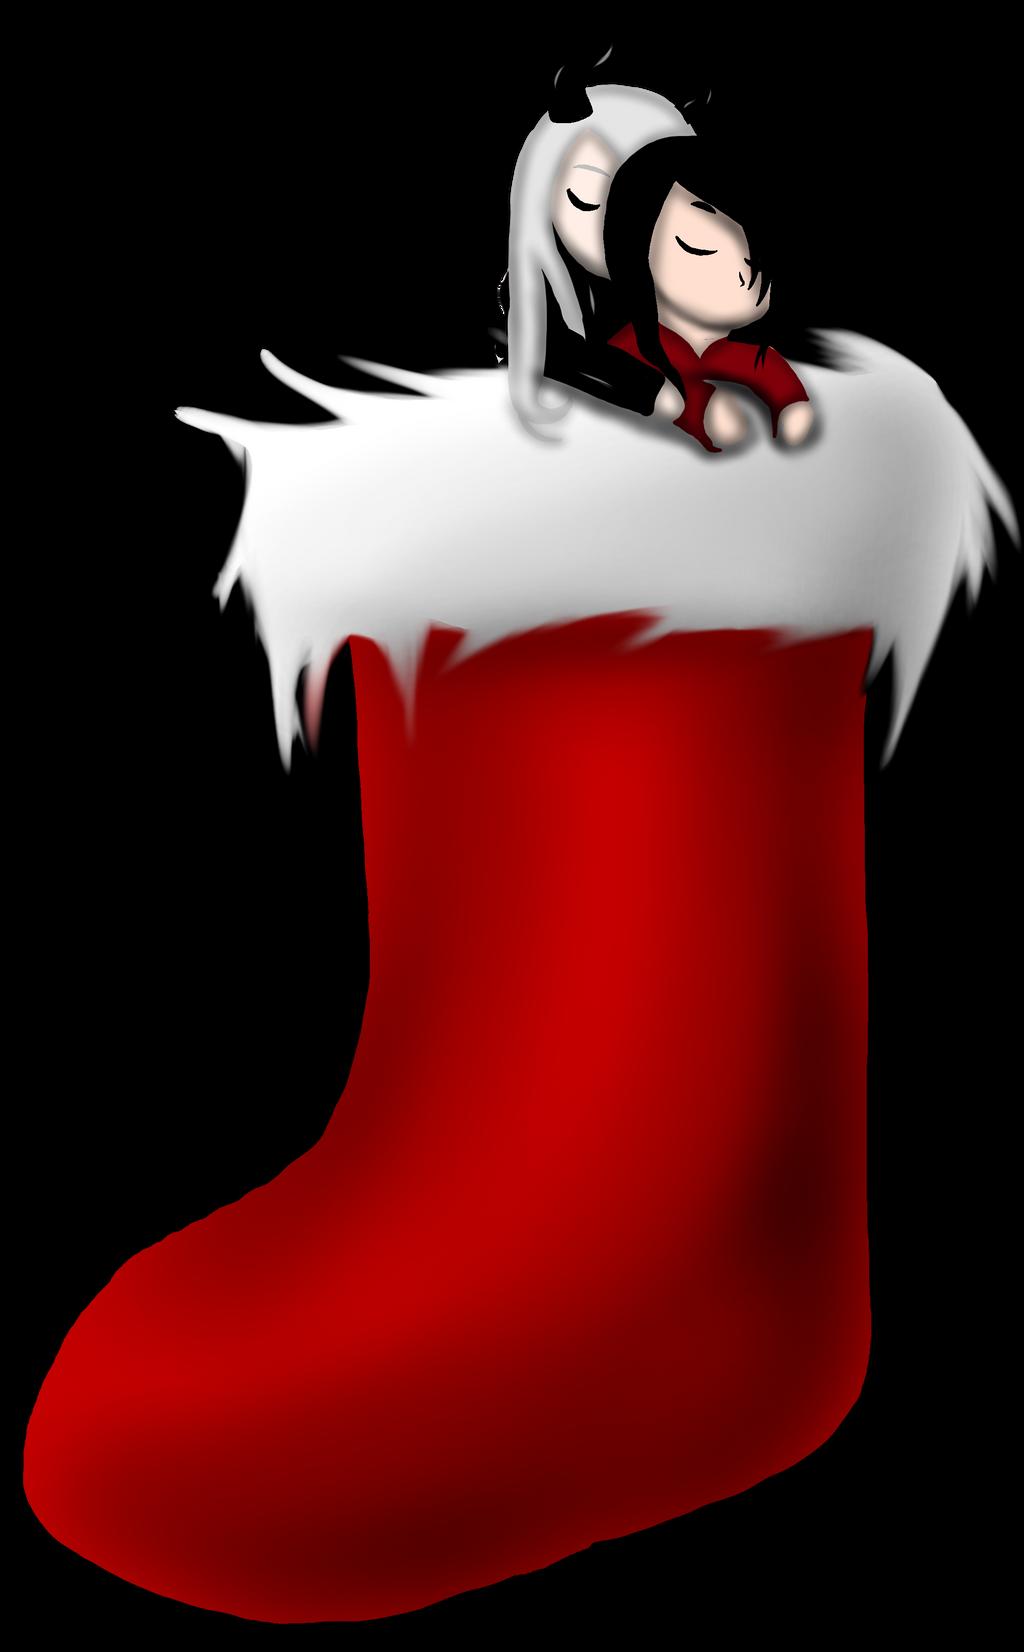 Ado Stocking by PrinceNeoShnieder